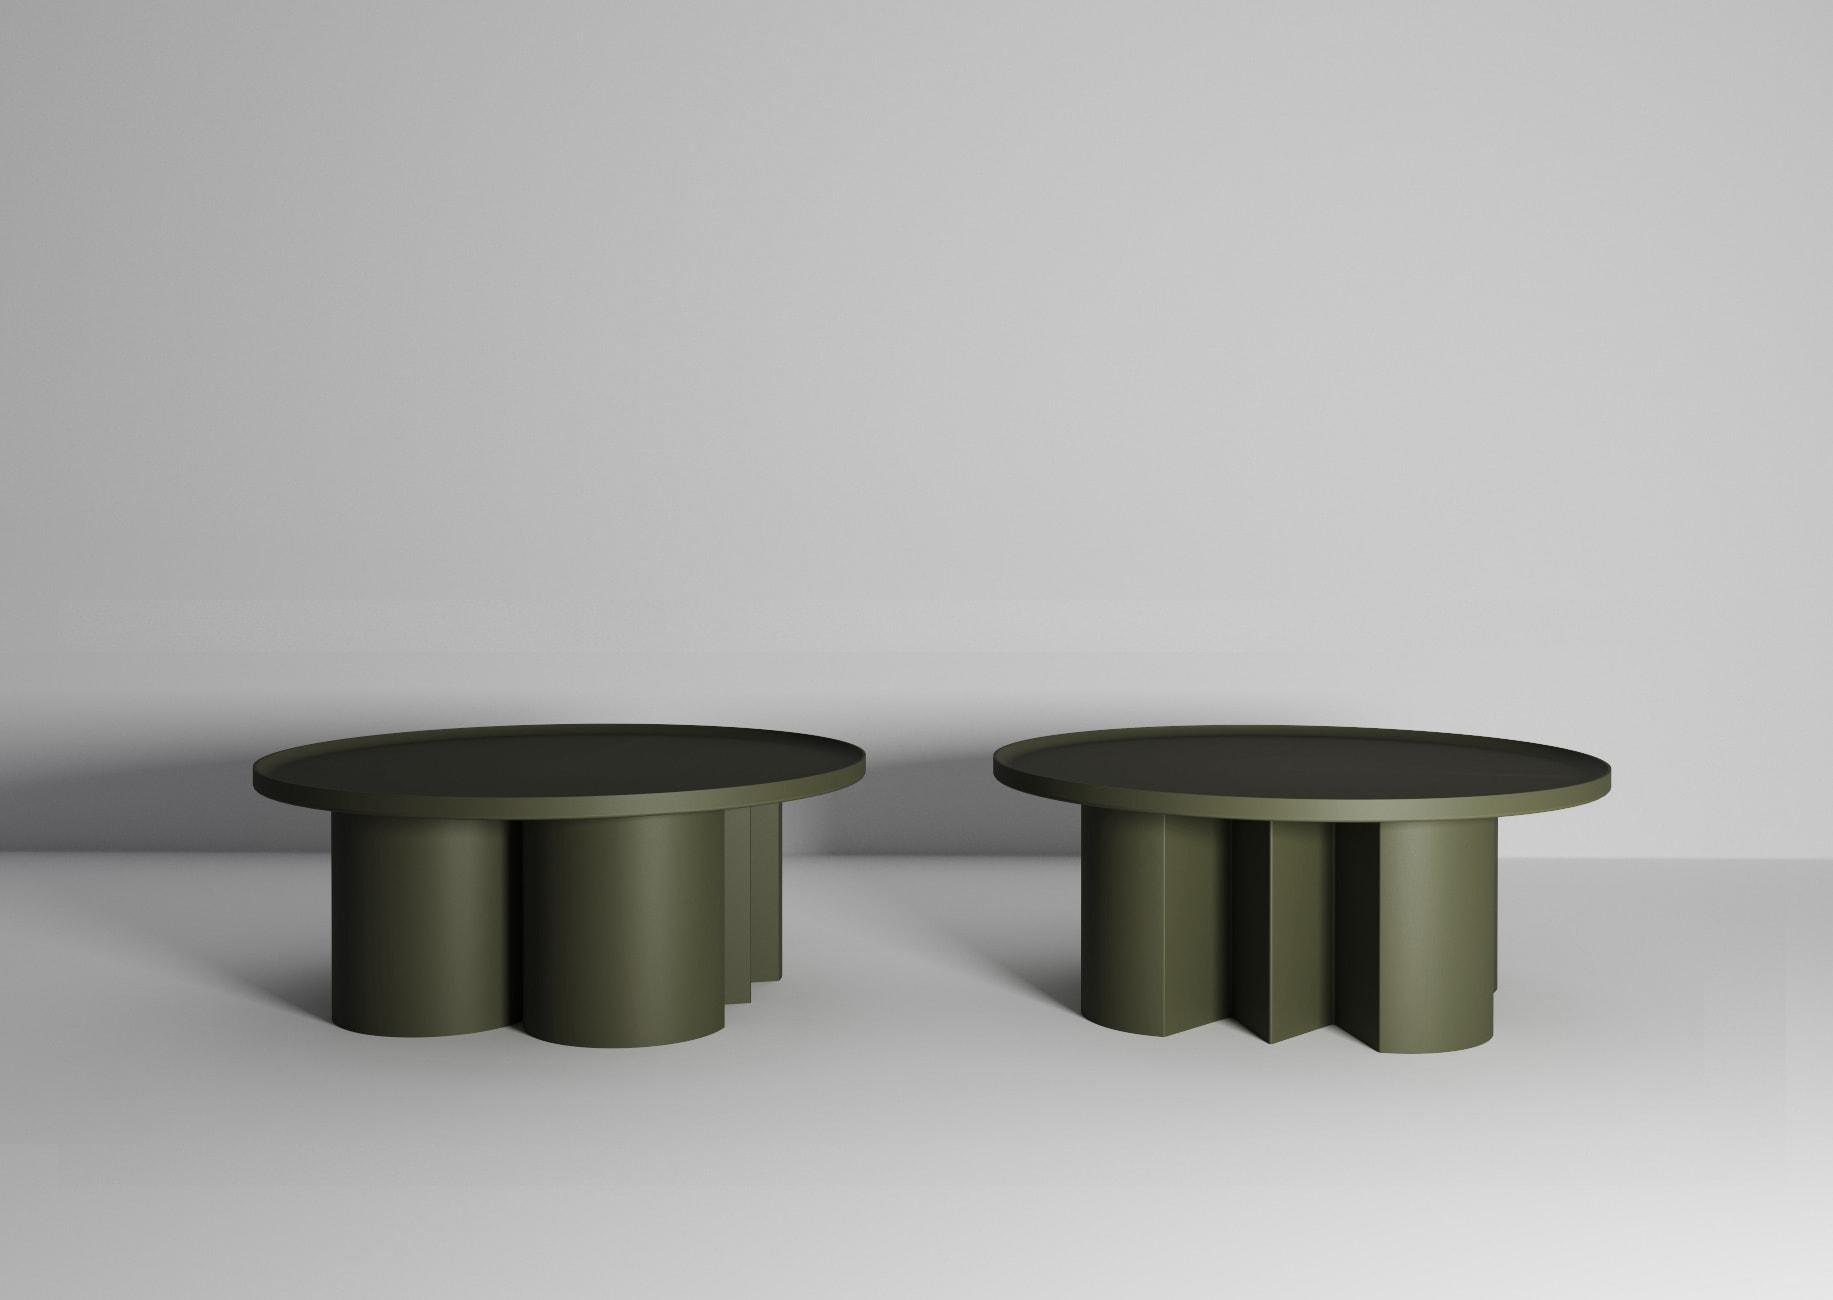 stella object furniture coffee table objekt nábytek konferenční stolek design jiri krejcirik